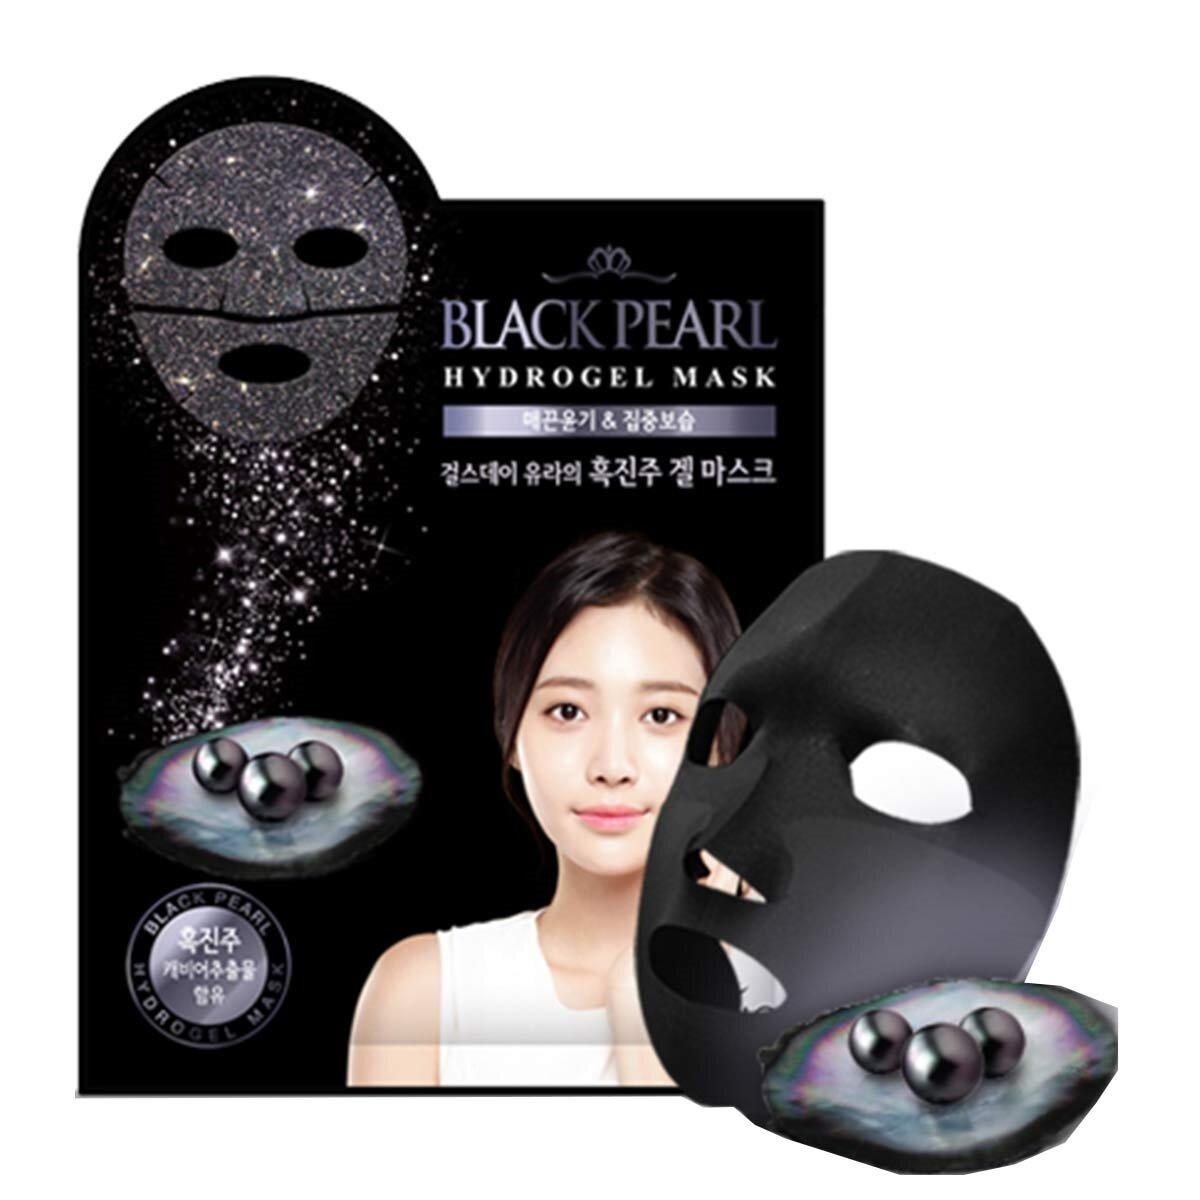 Black Pearl Hydrogel Maske